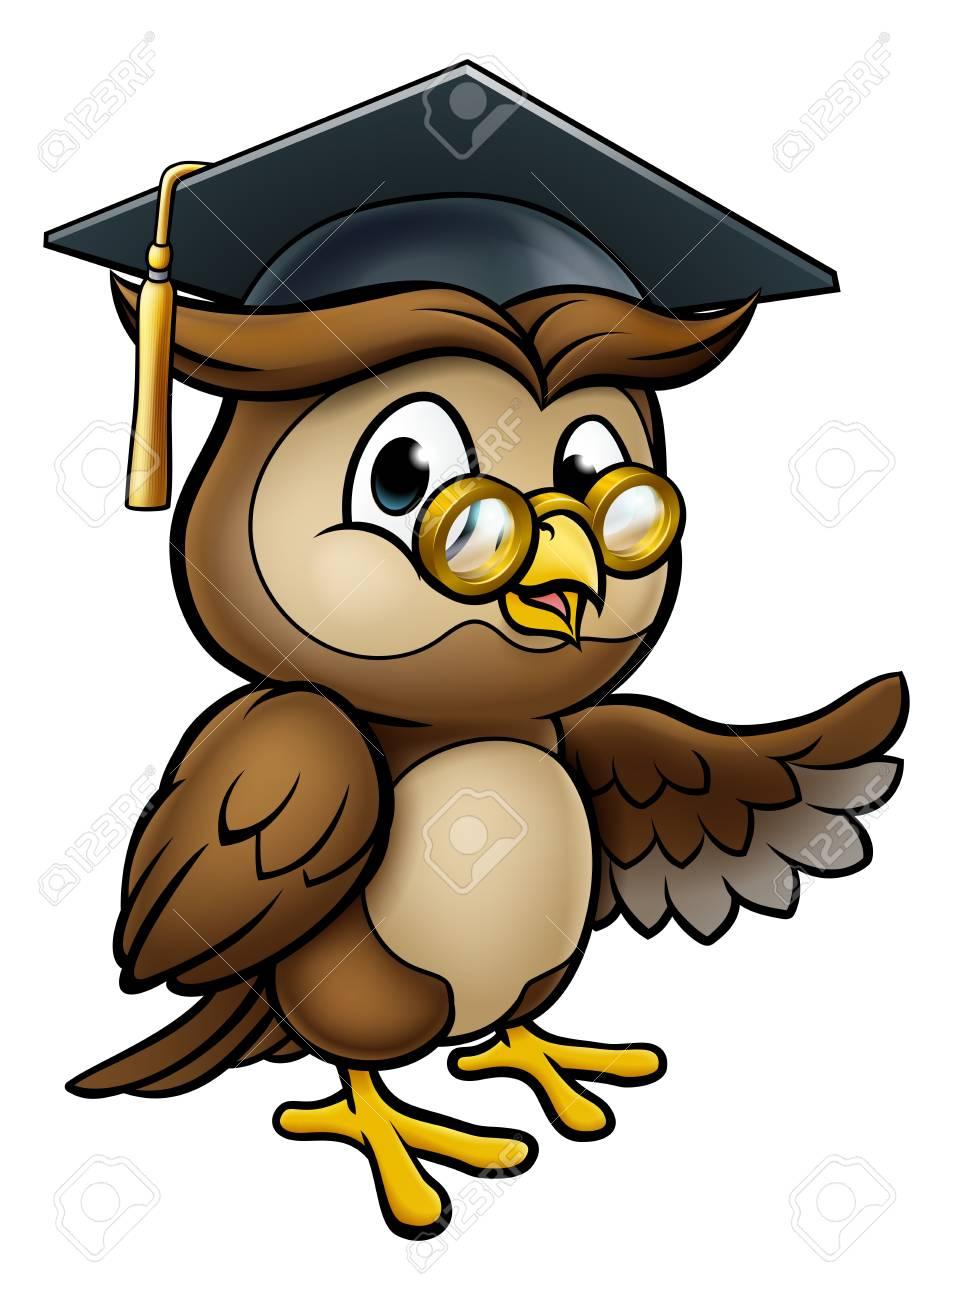 Wise Owl Cartoon Graduate Teacher Pointing.